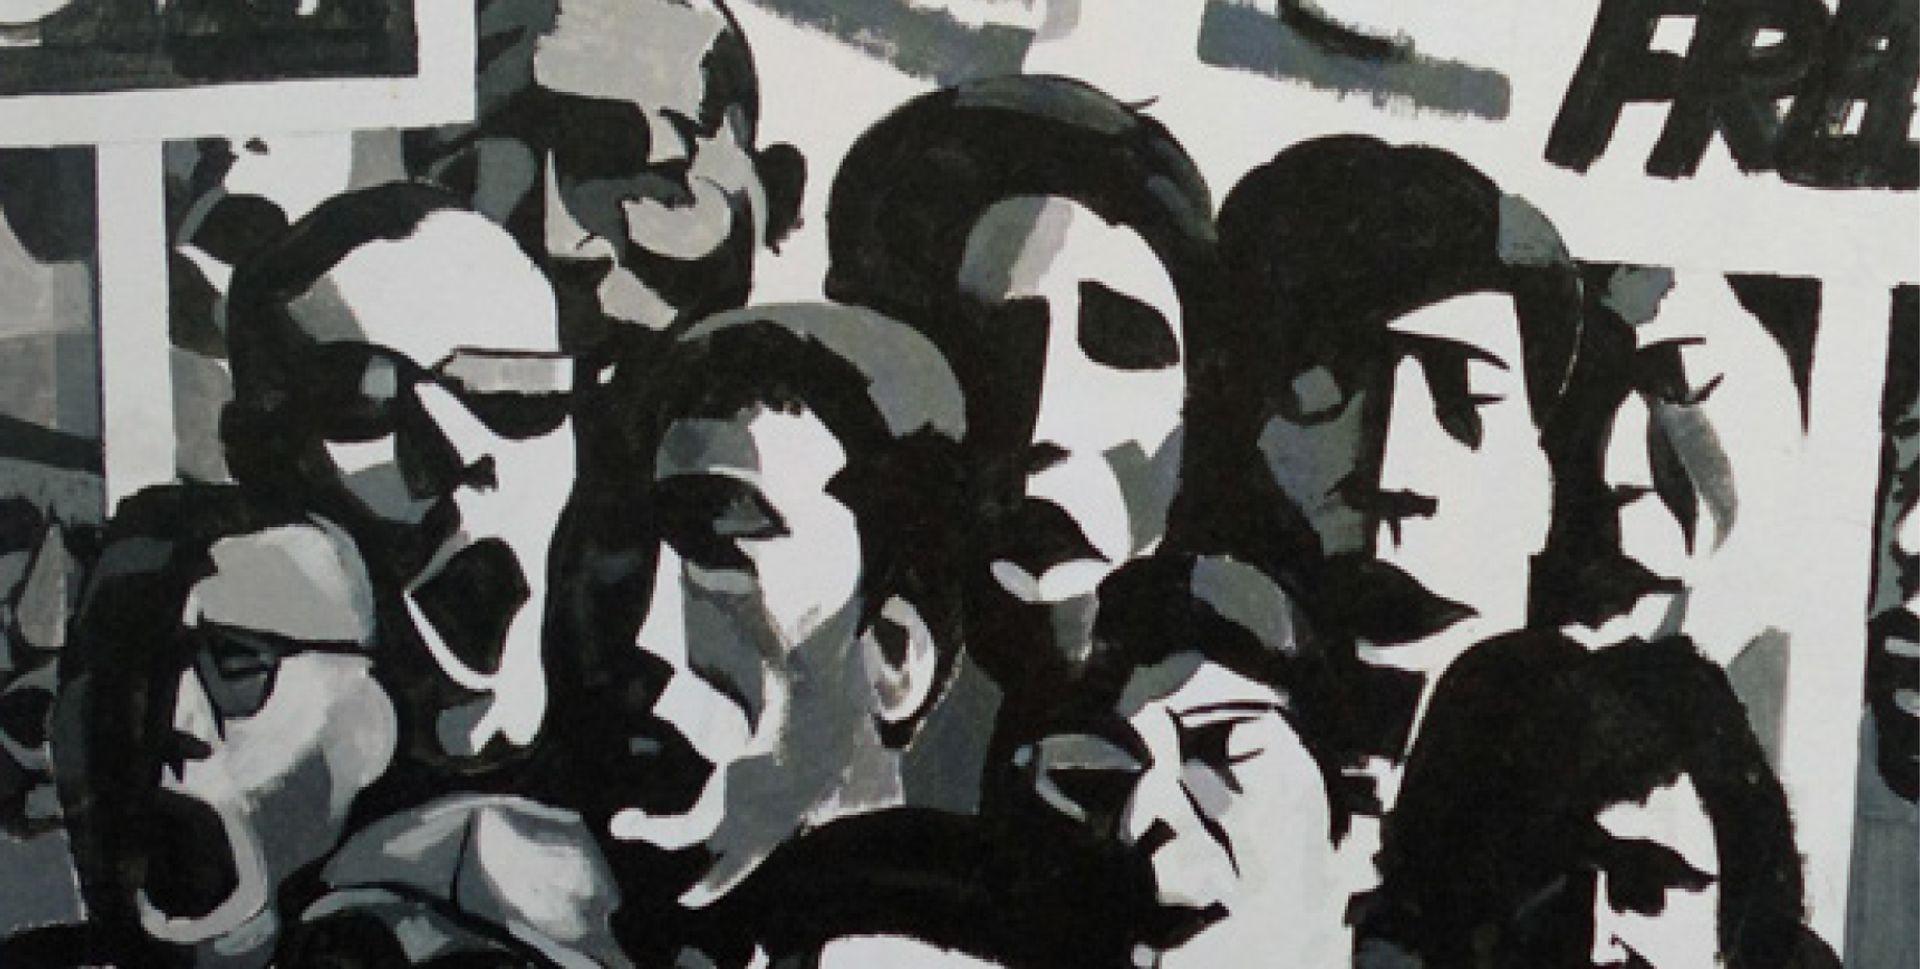 Reginald Gammon, Freedom Now (around 1963) Reginald Gammon, Freedom Now (around 1963)